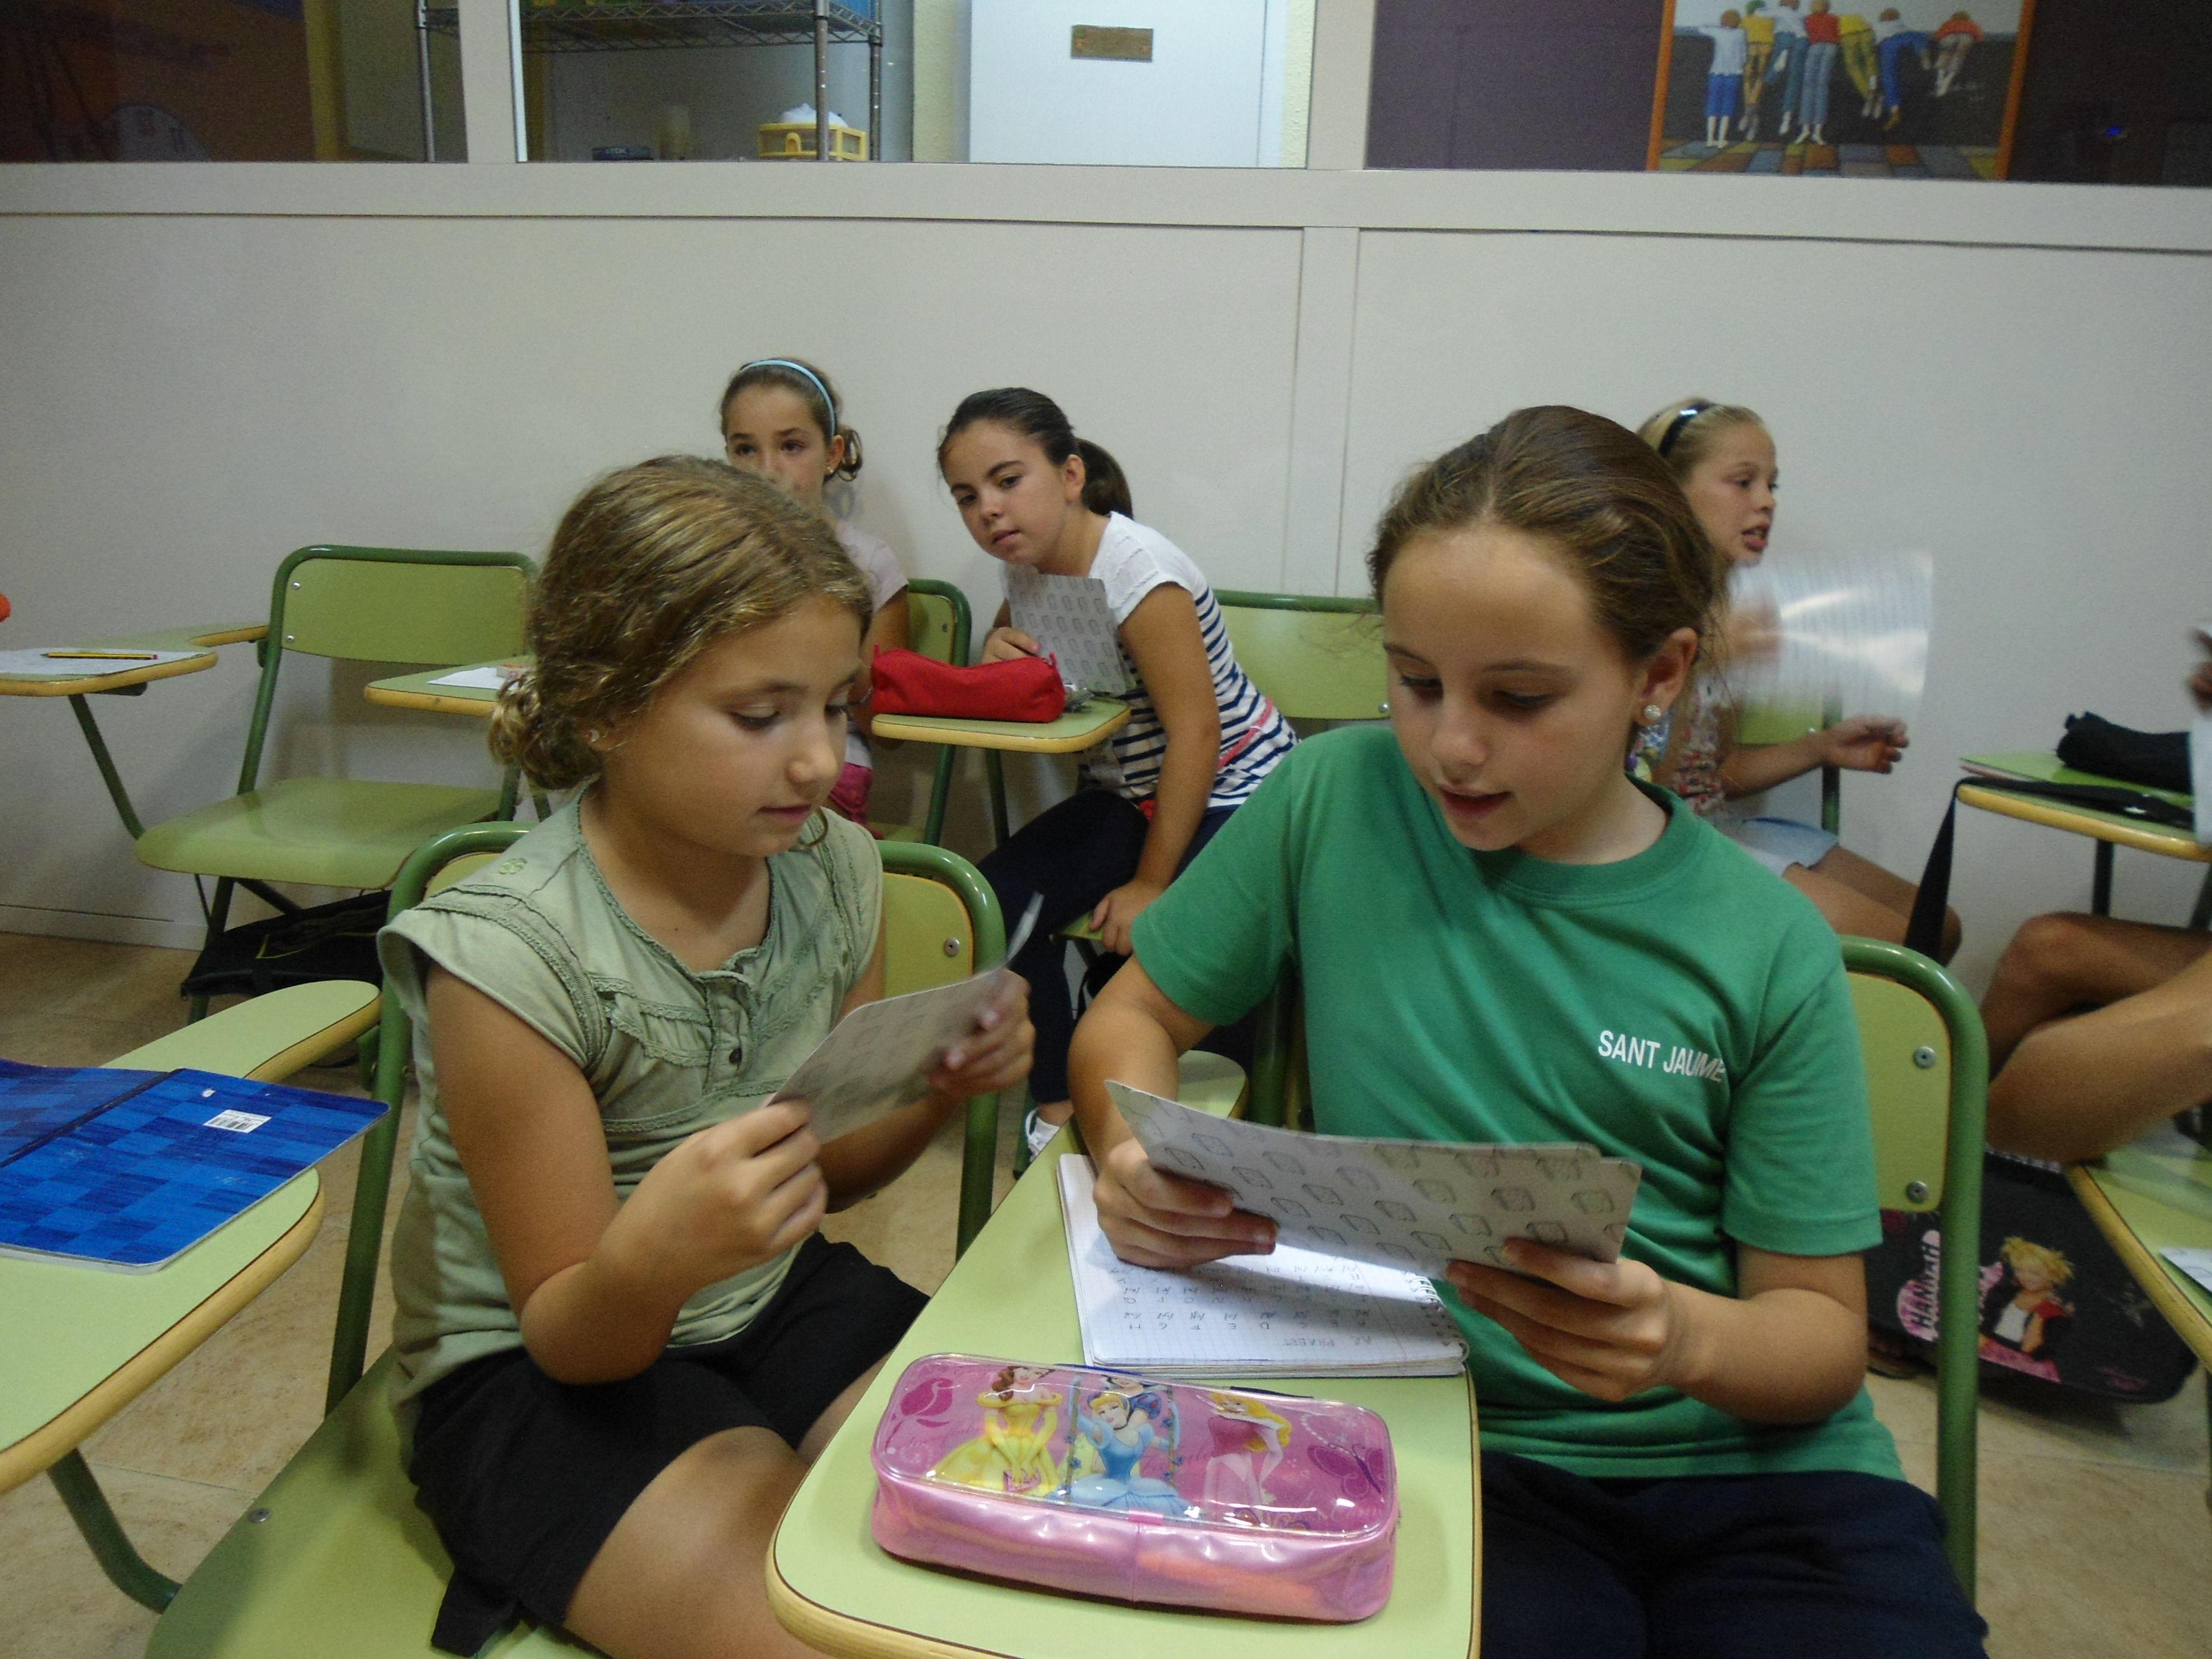 Foto 38 de Academias de idiomas en Moncada | Centre d'Estudis Etnies